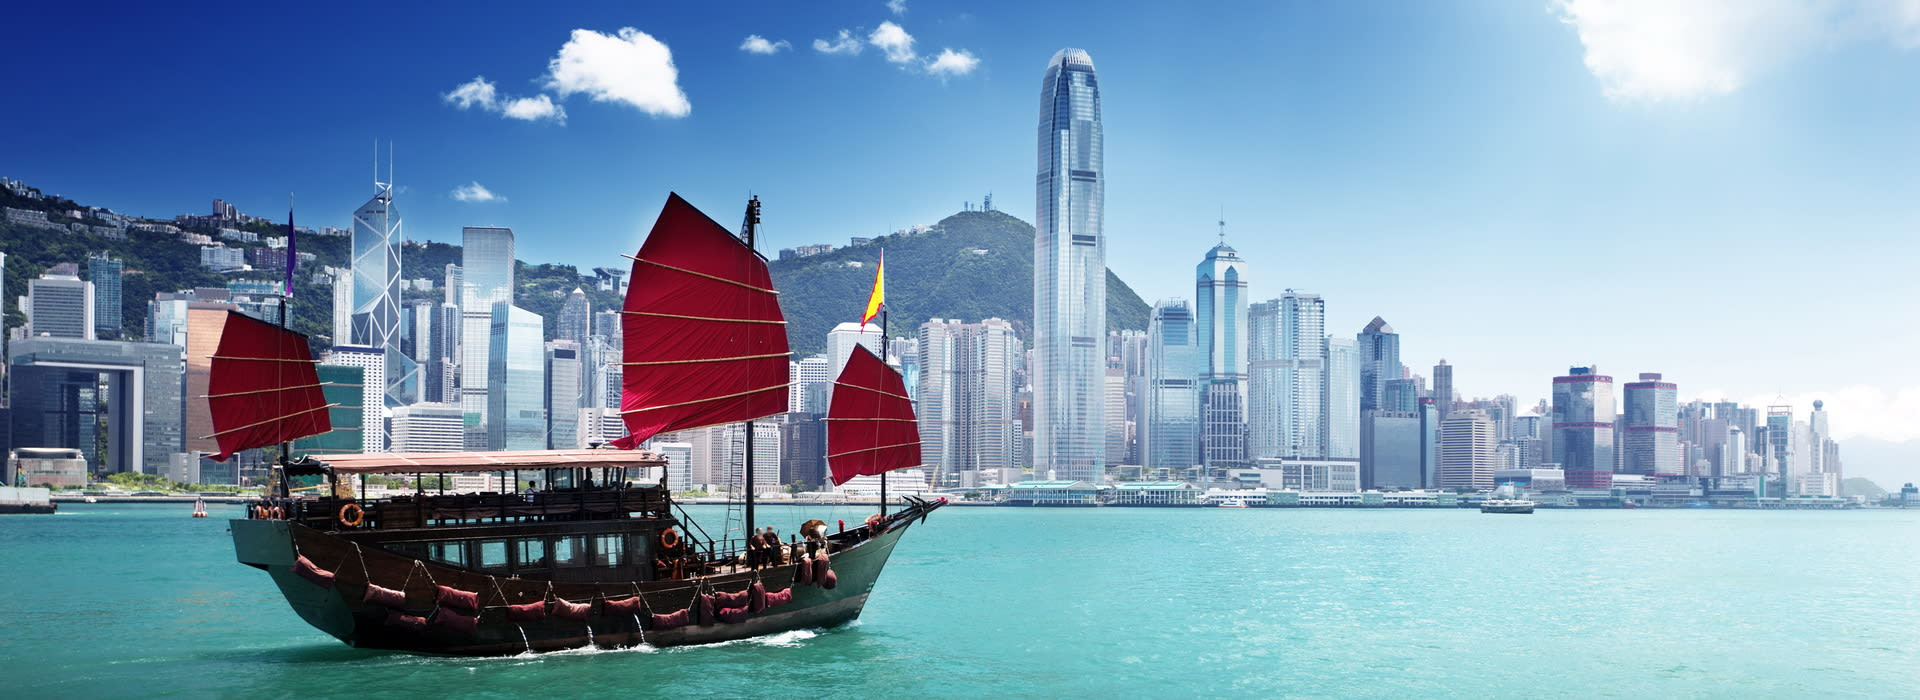 Hong Kong Thailand Cosmopolitan